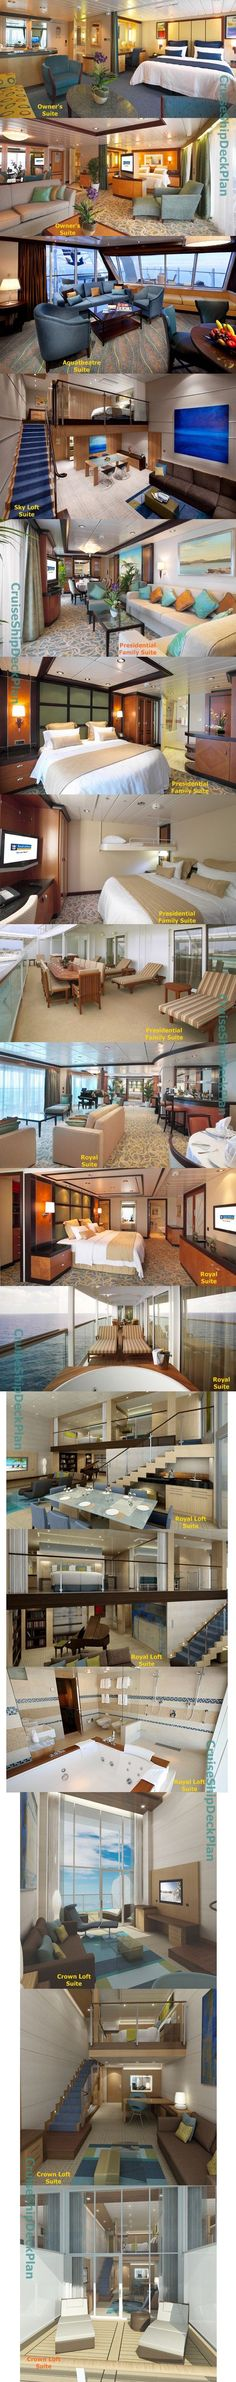 Royal Caribbean Harmony of the Seas suites photos